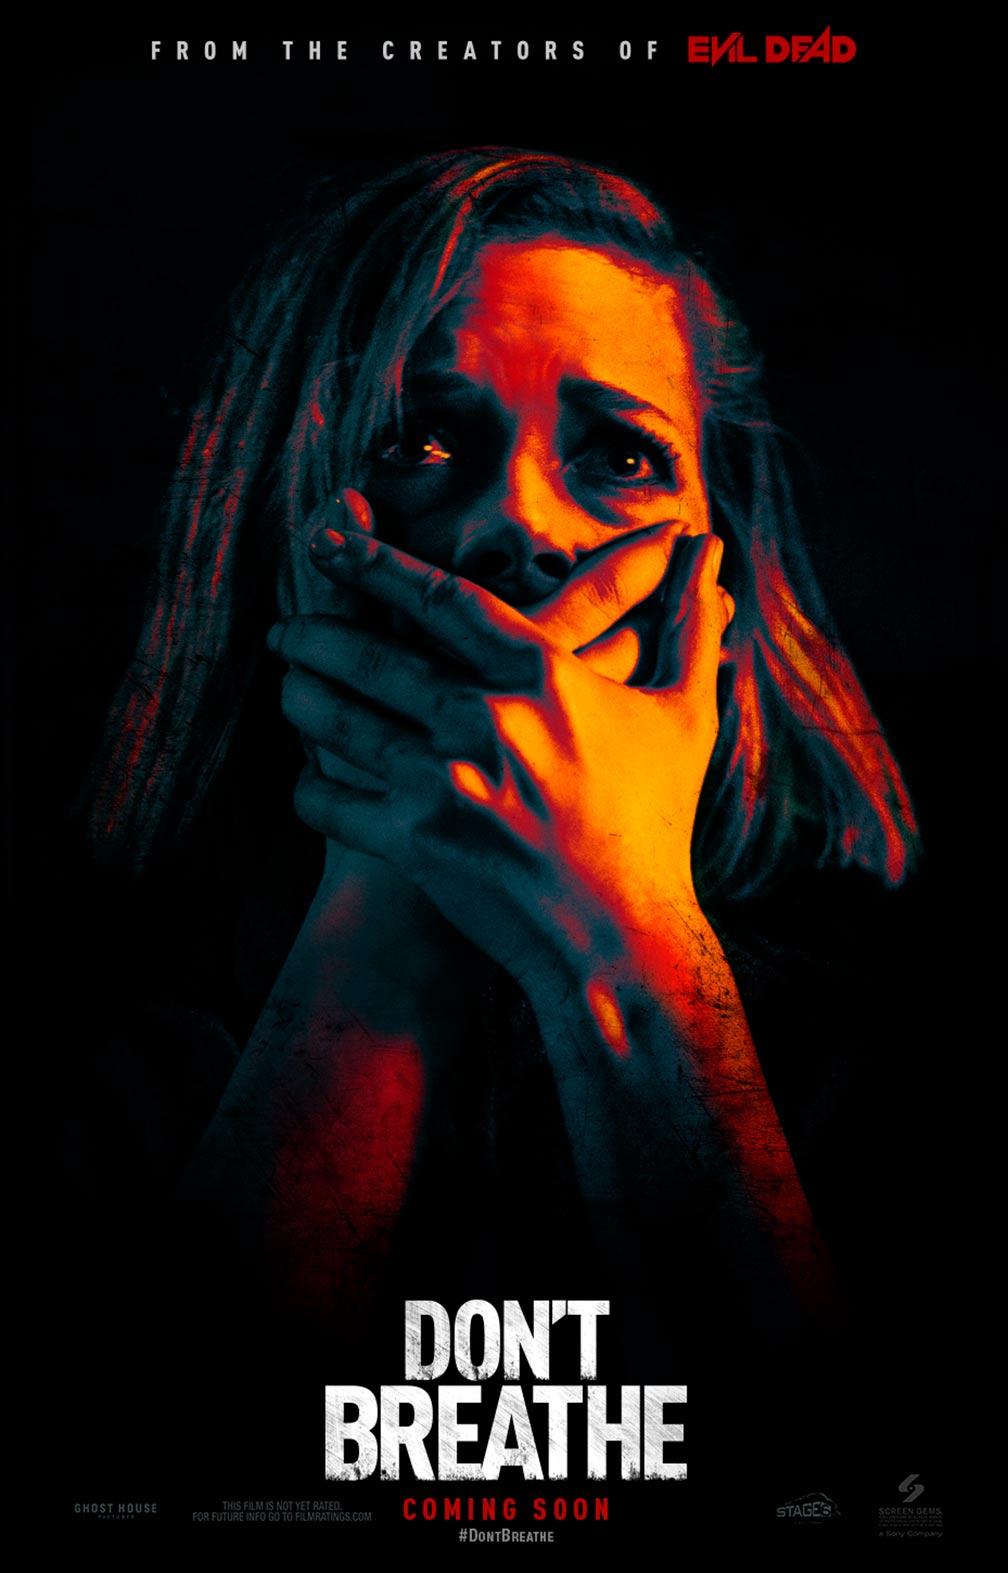 Don't Breathe (2016) Poster #2 - Trailer Addict